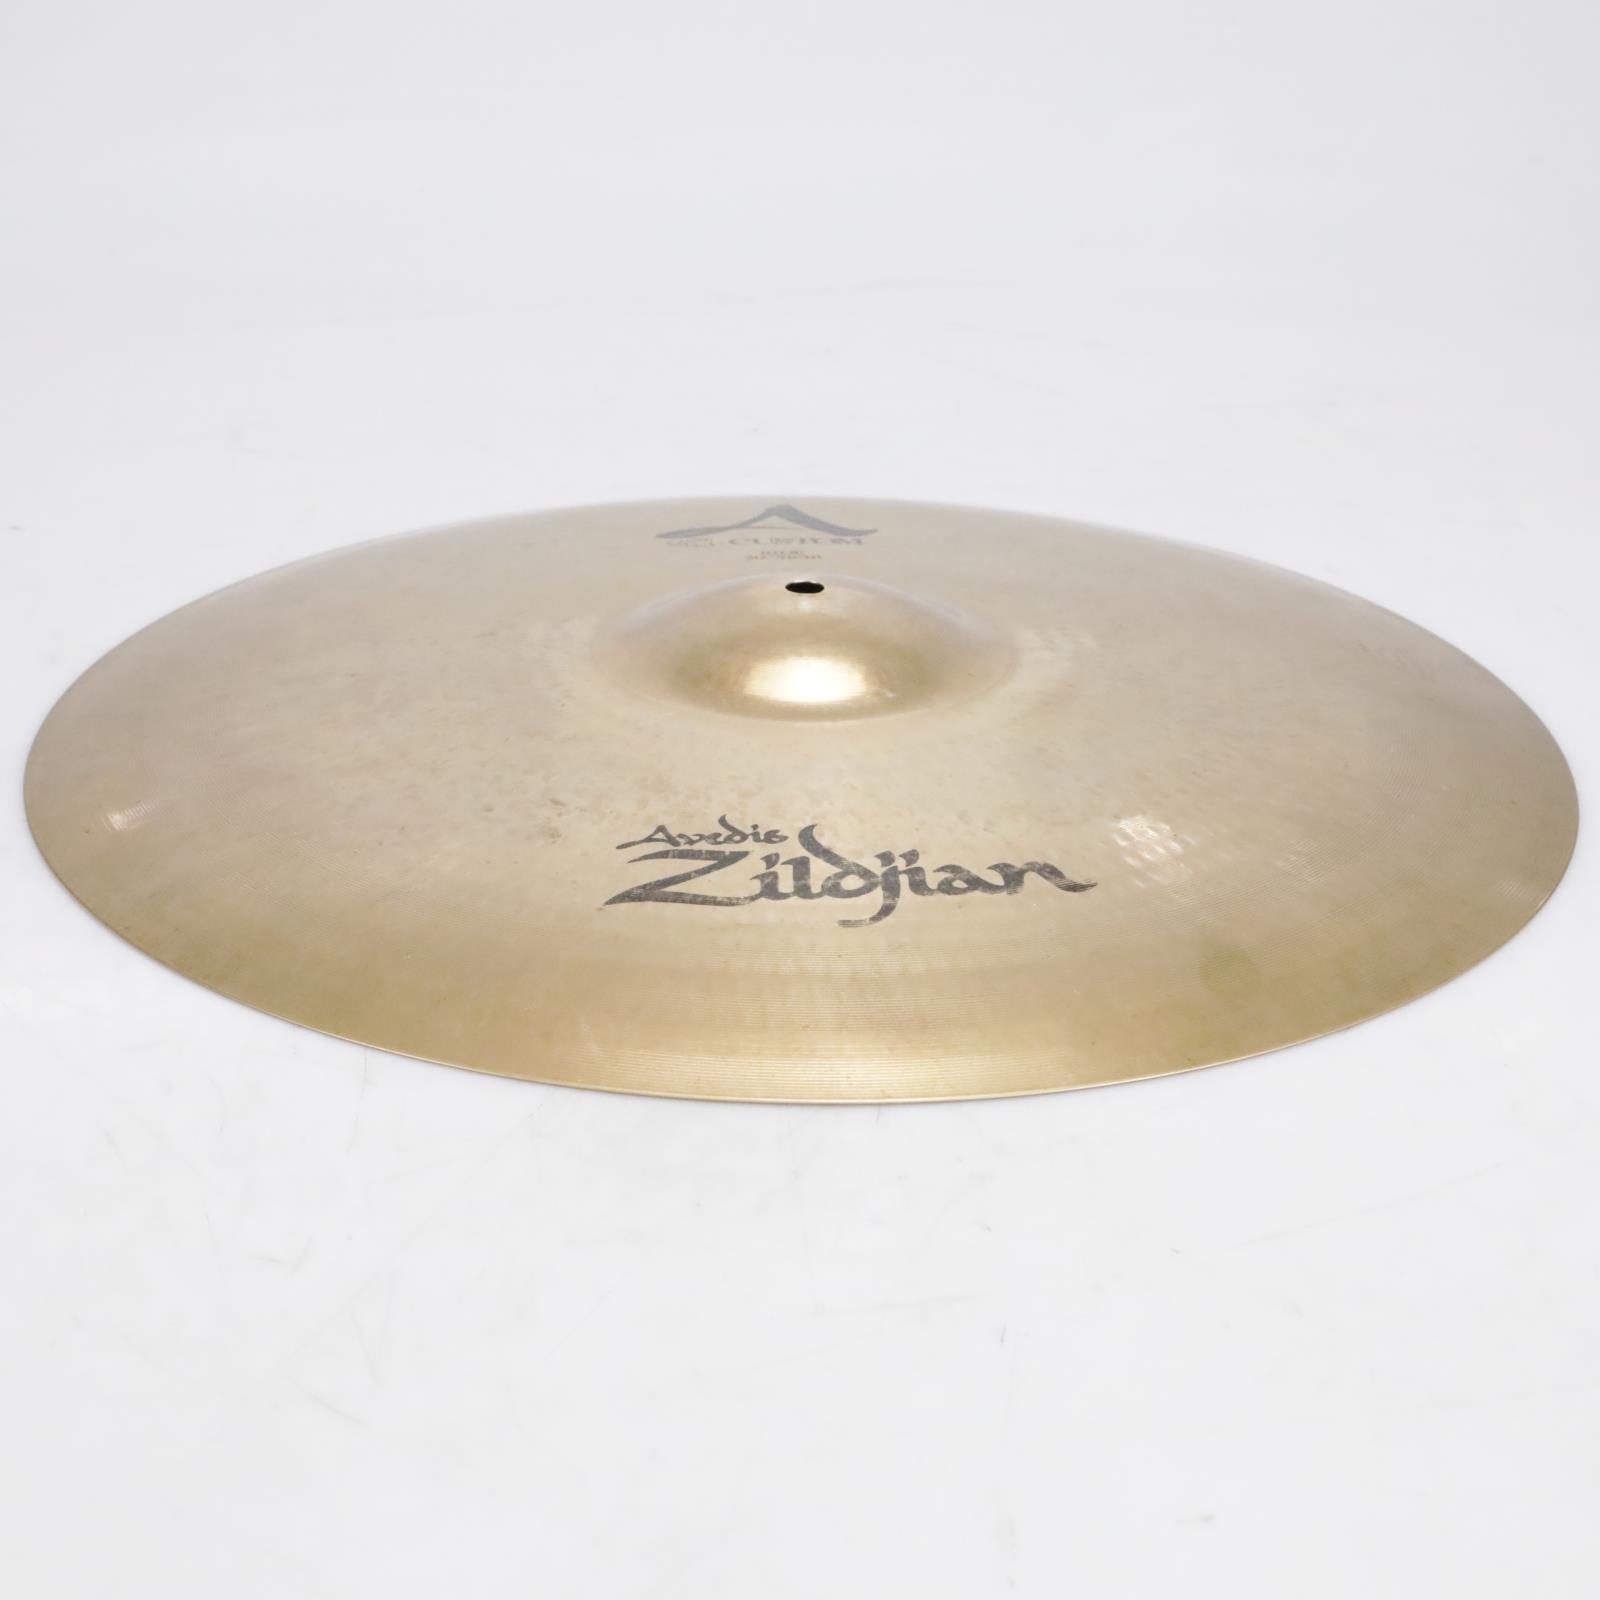 "Zildjian A Custom A20518 20""/51cm Ride Cymbal Video! #41304"